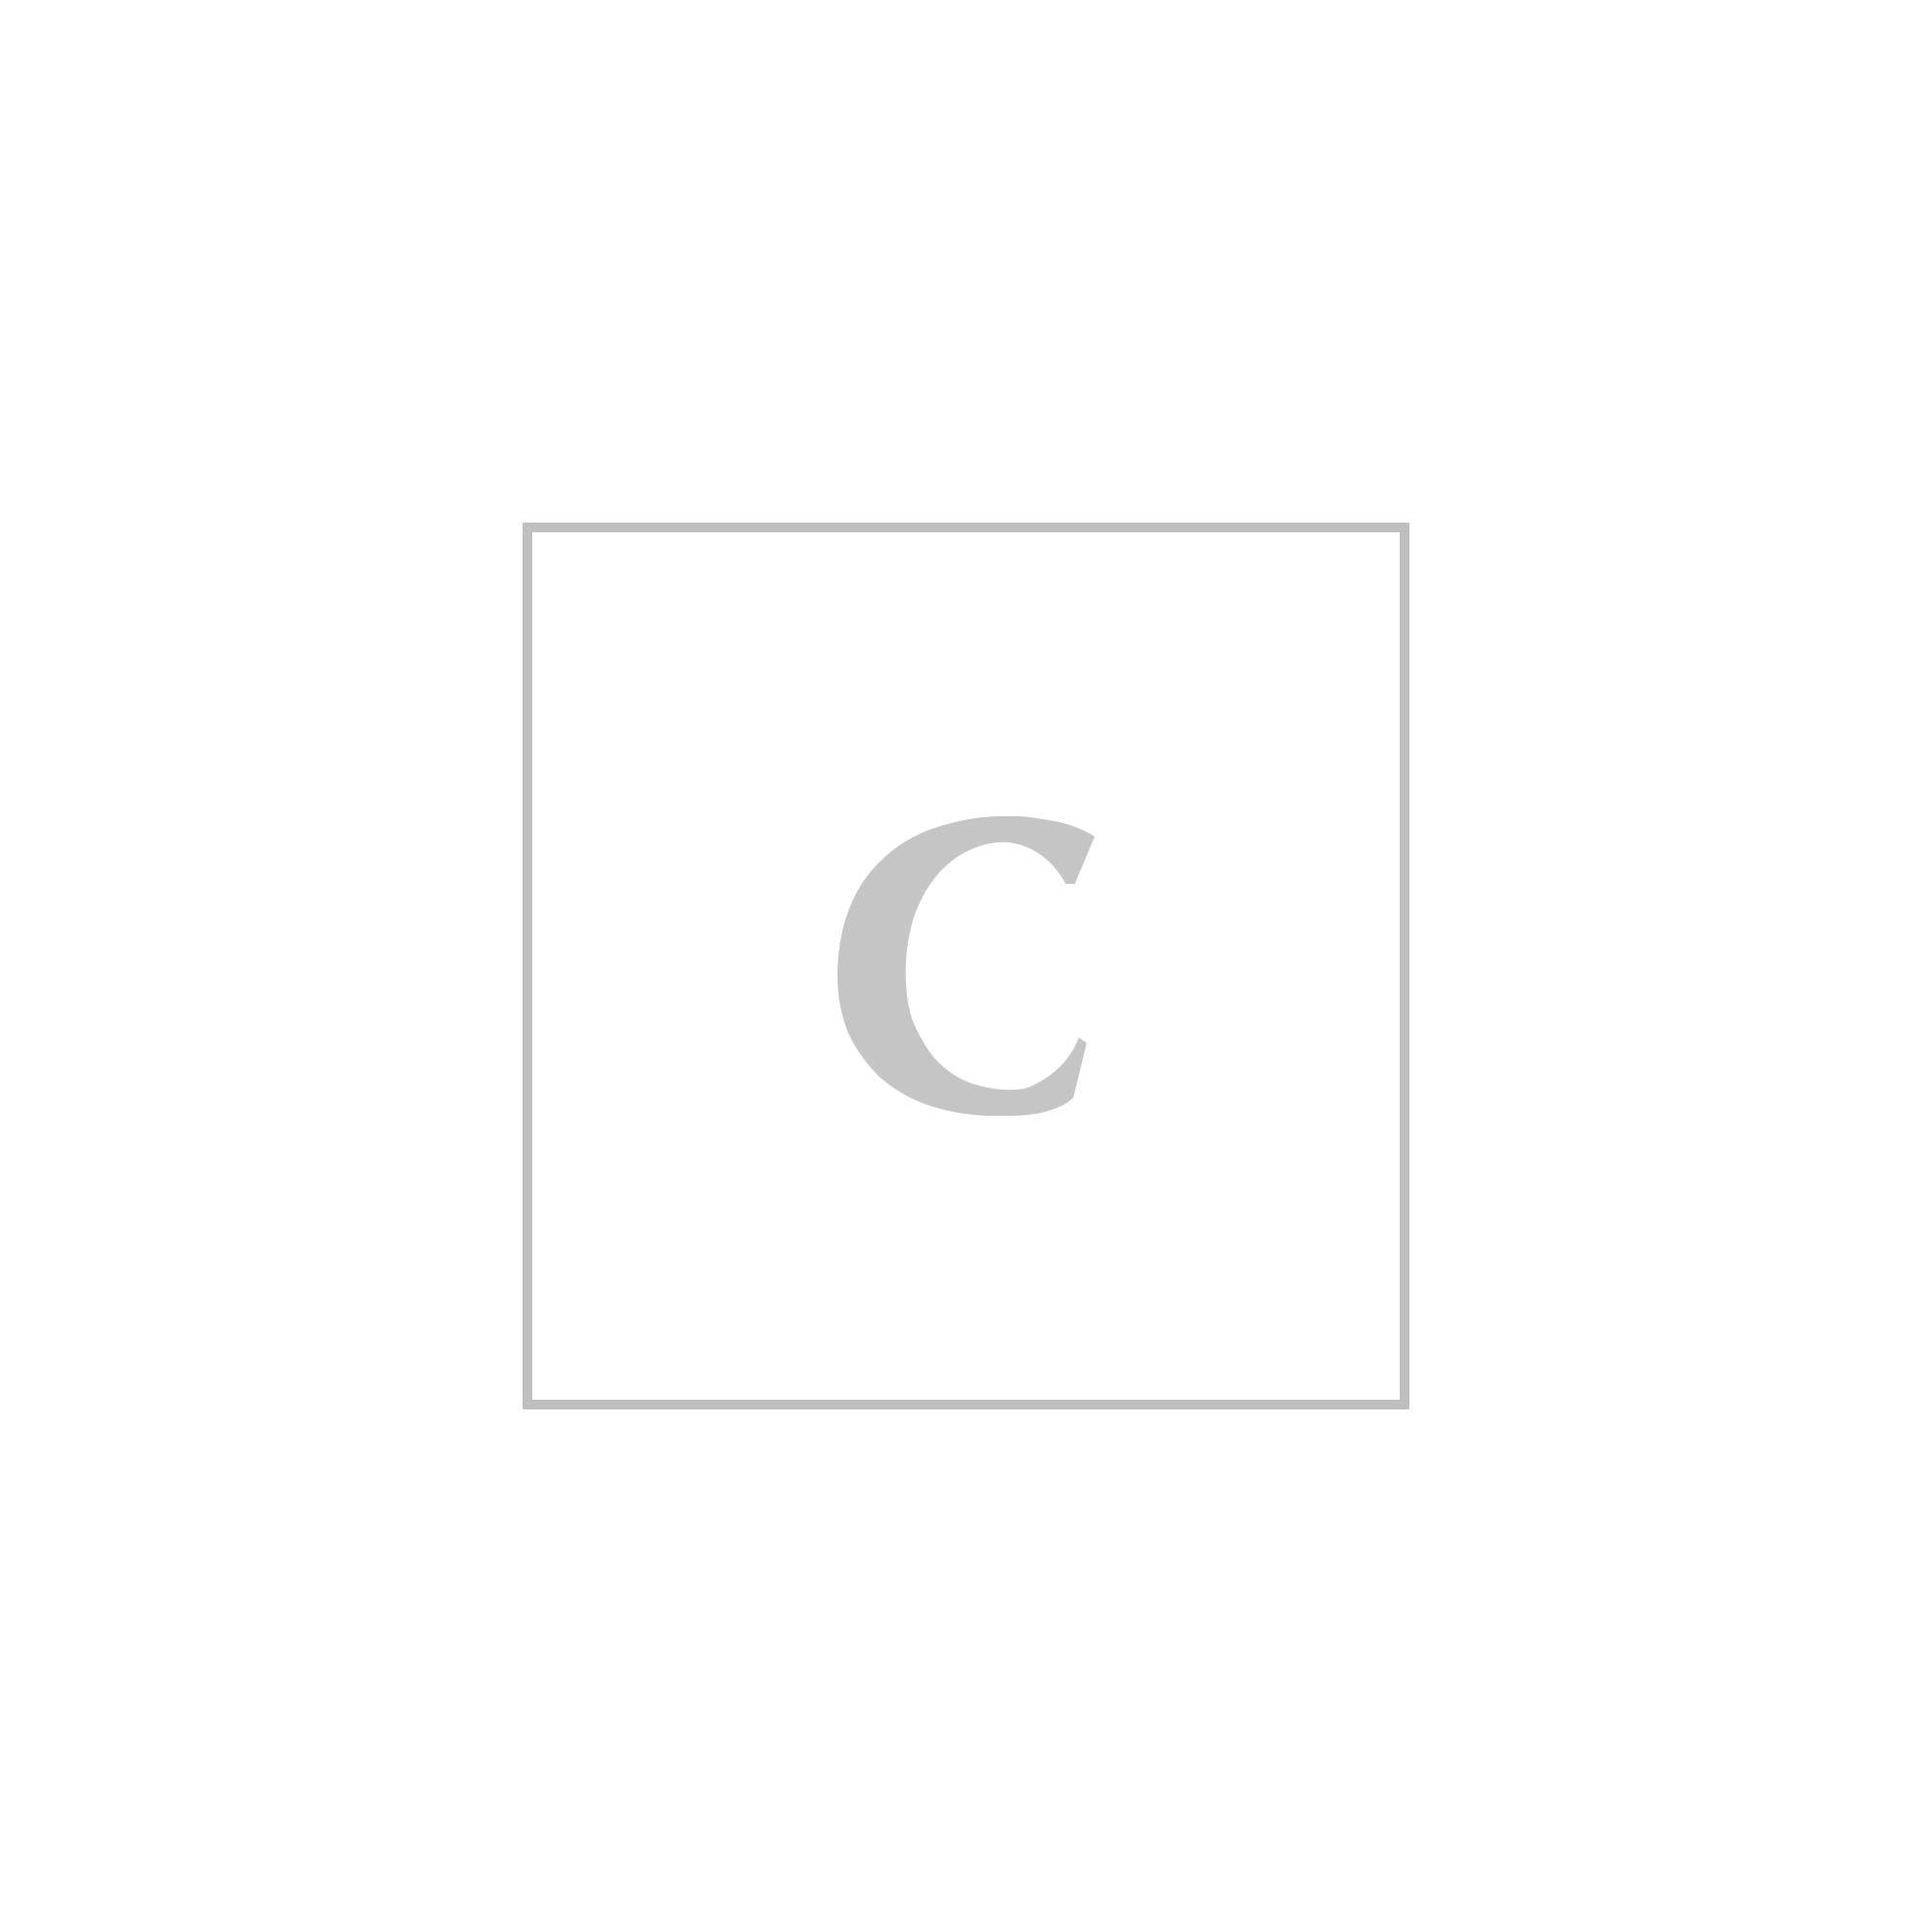 Prada macro tartan chiffon top